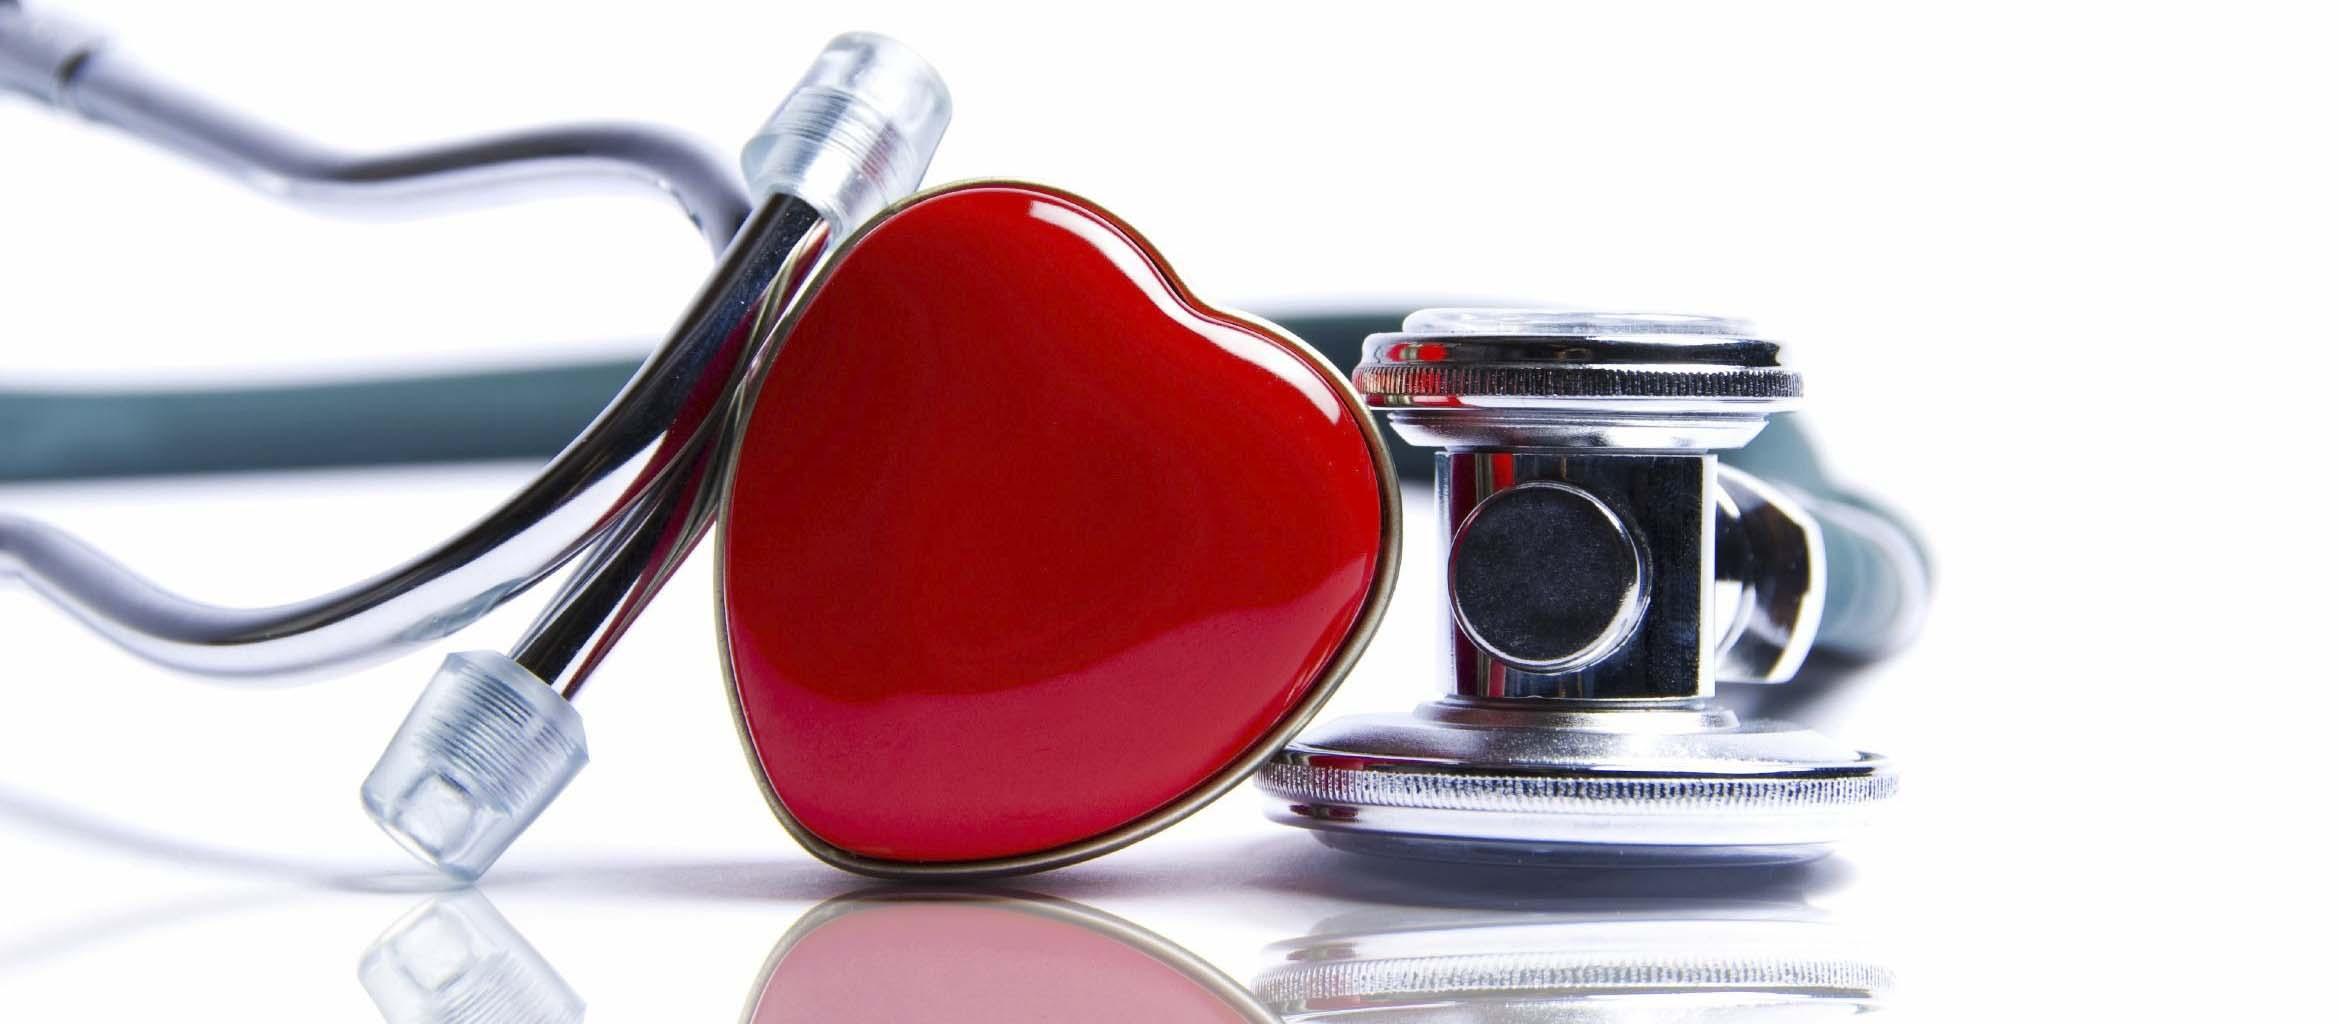 bright-cardiac-cardiology-stethoscope